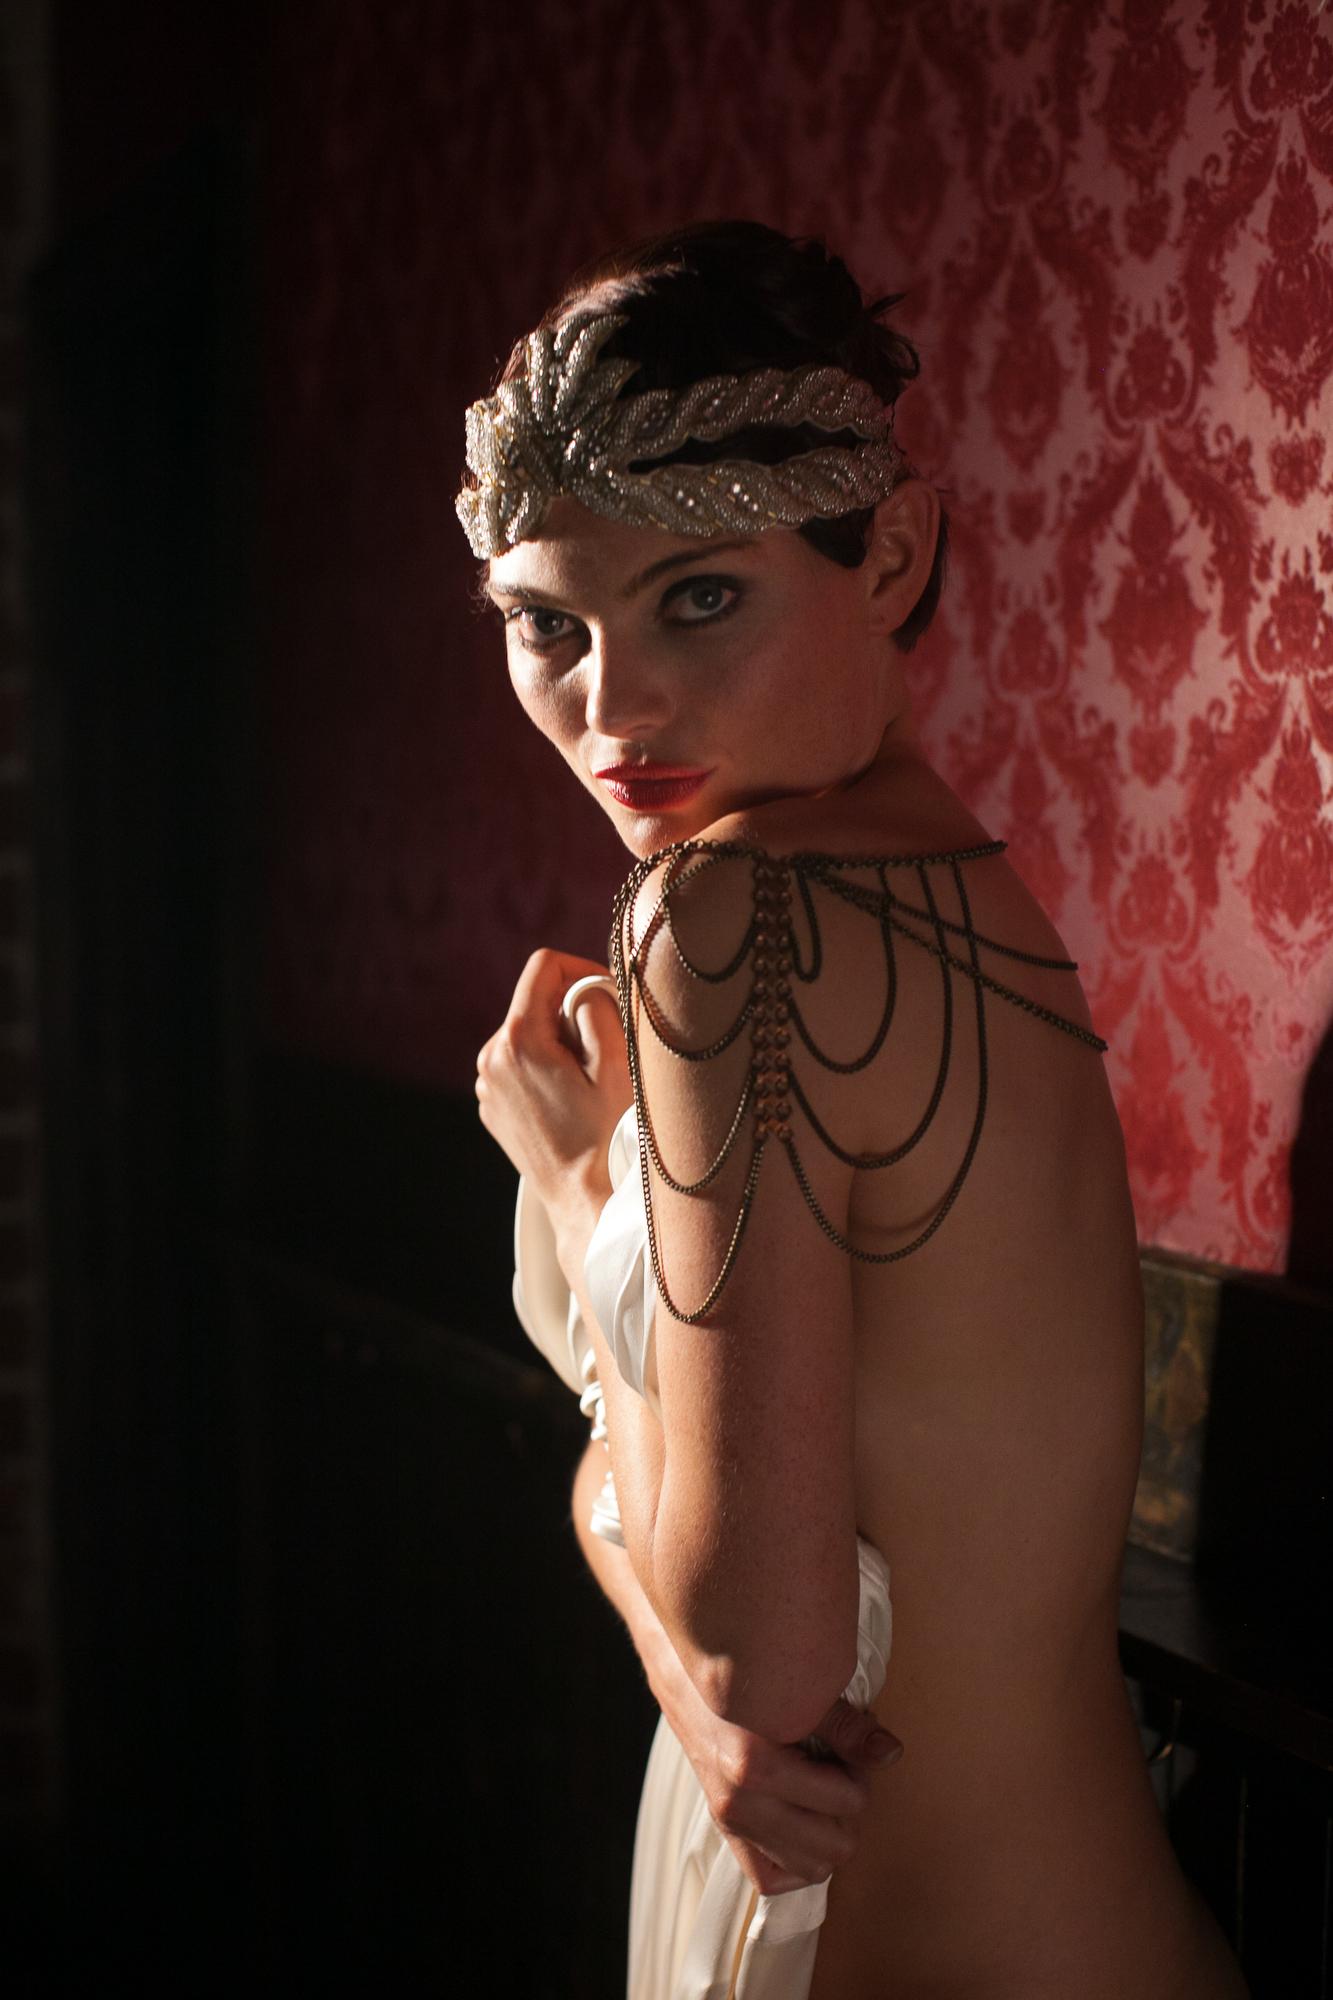 jennifer-skog-bridal-fashion-photographer-lifestyle-0023.jpg